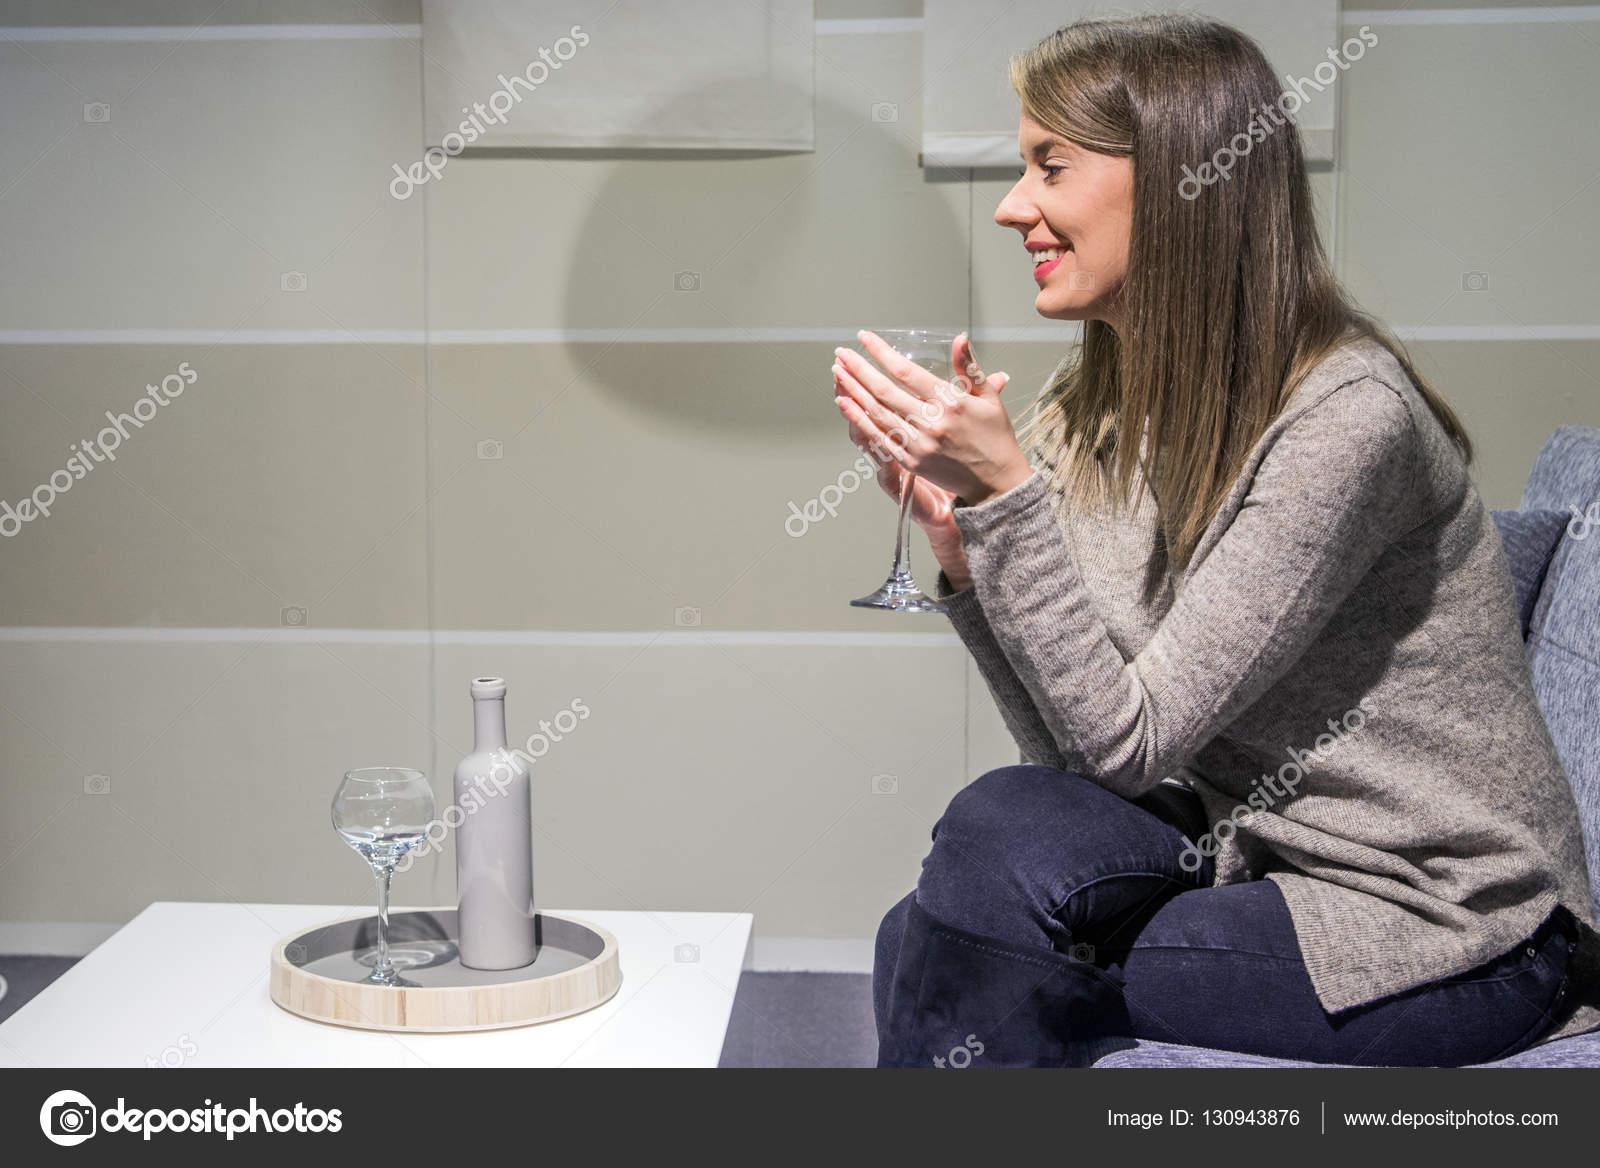 Miraculous Portrait Young Woman Holding Wineglass While Sitting On Inzonedesignstudio Interior Chair Design Inzonedesignstudiocom